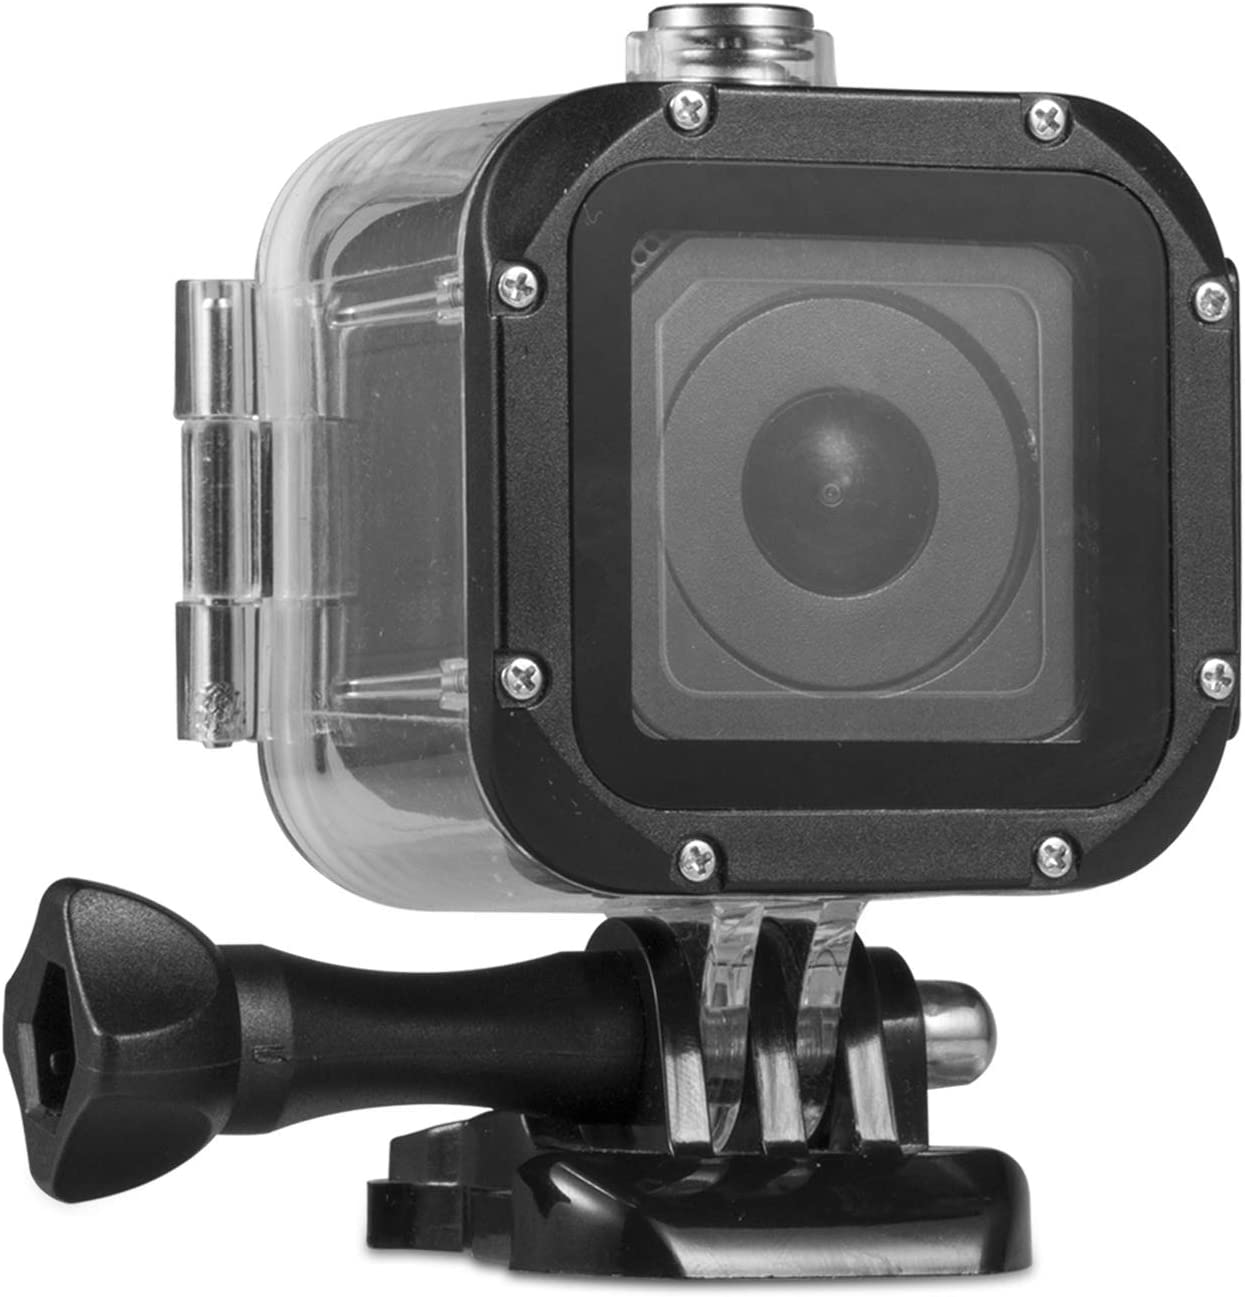 Kupton Gehäuse Hülle Für Gopro Hero 5 Session Kamera